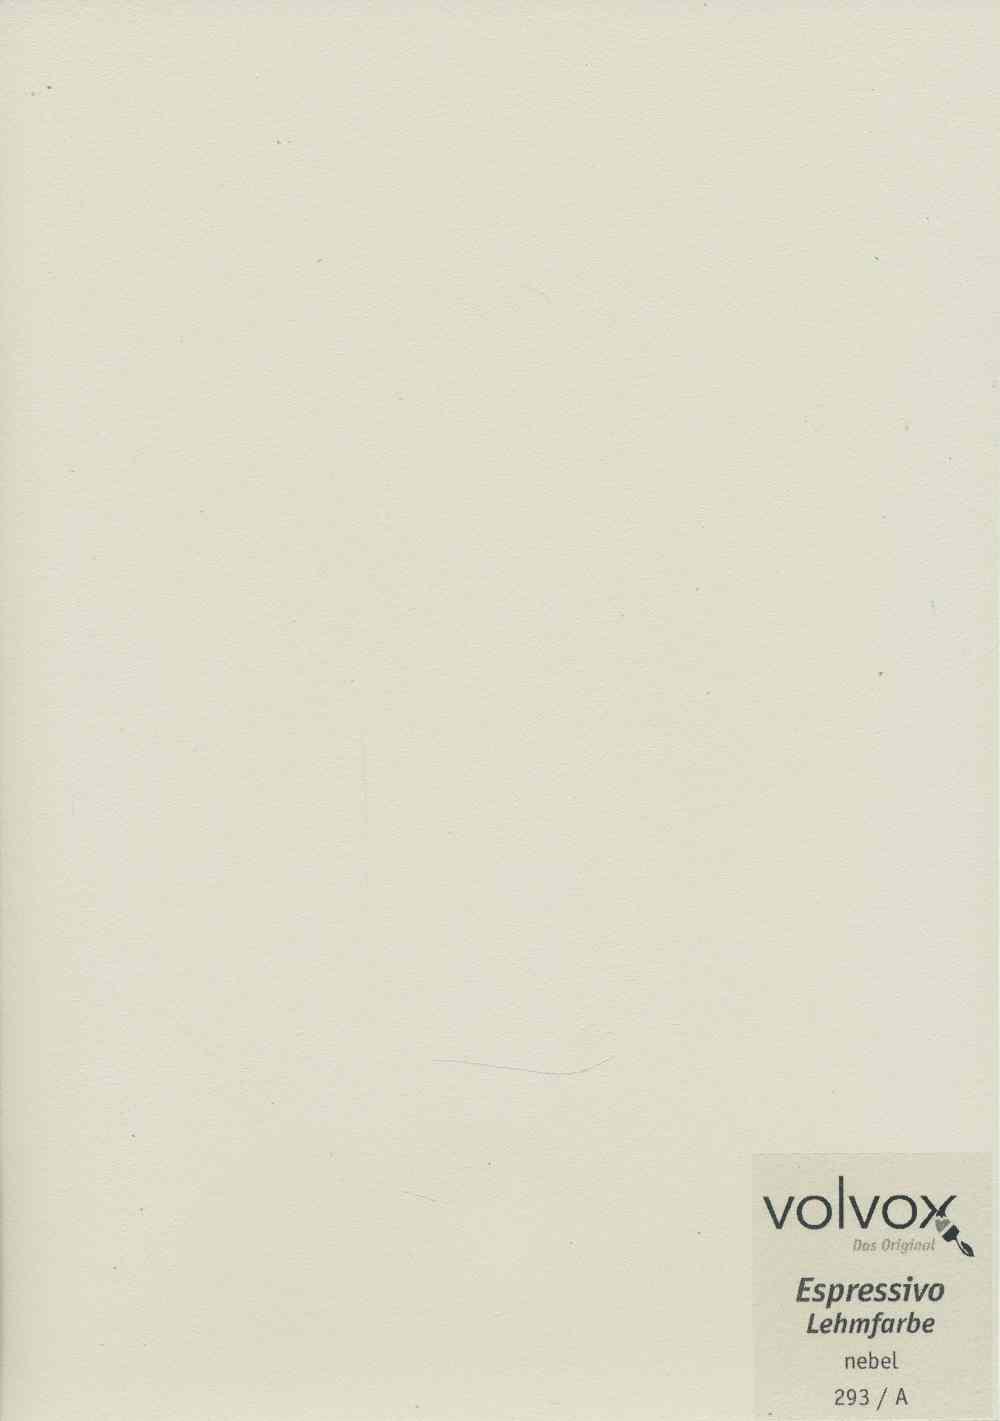 Volvox Espressivo Lehmfarbe 293 nebel